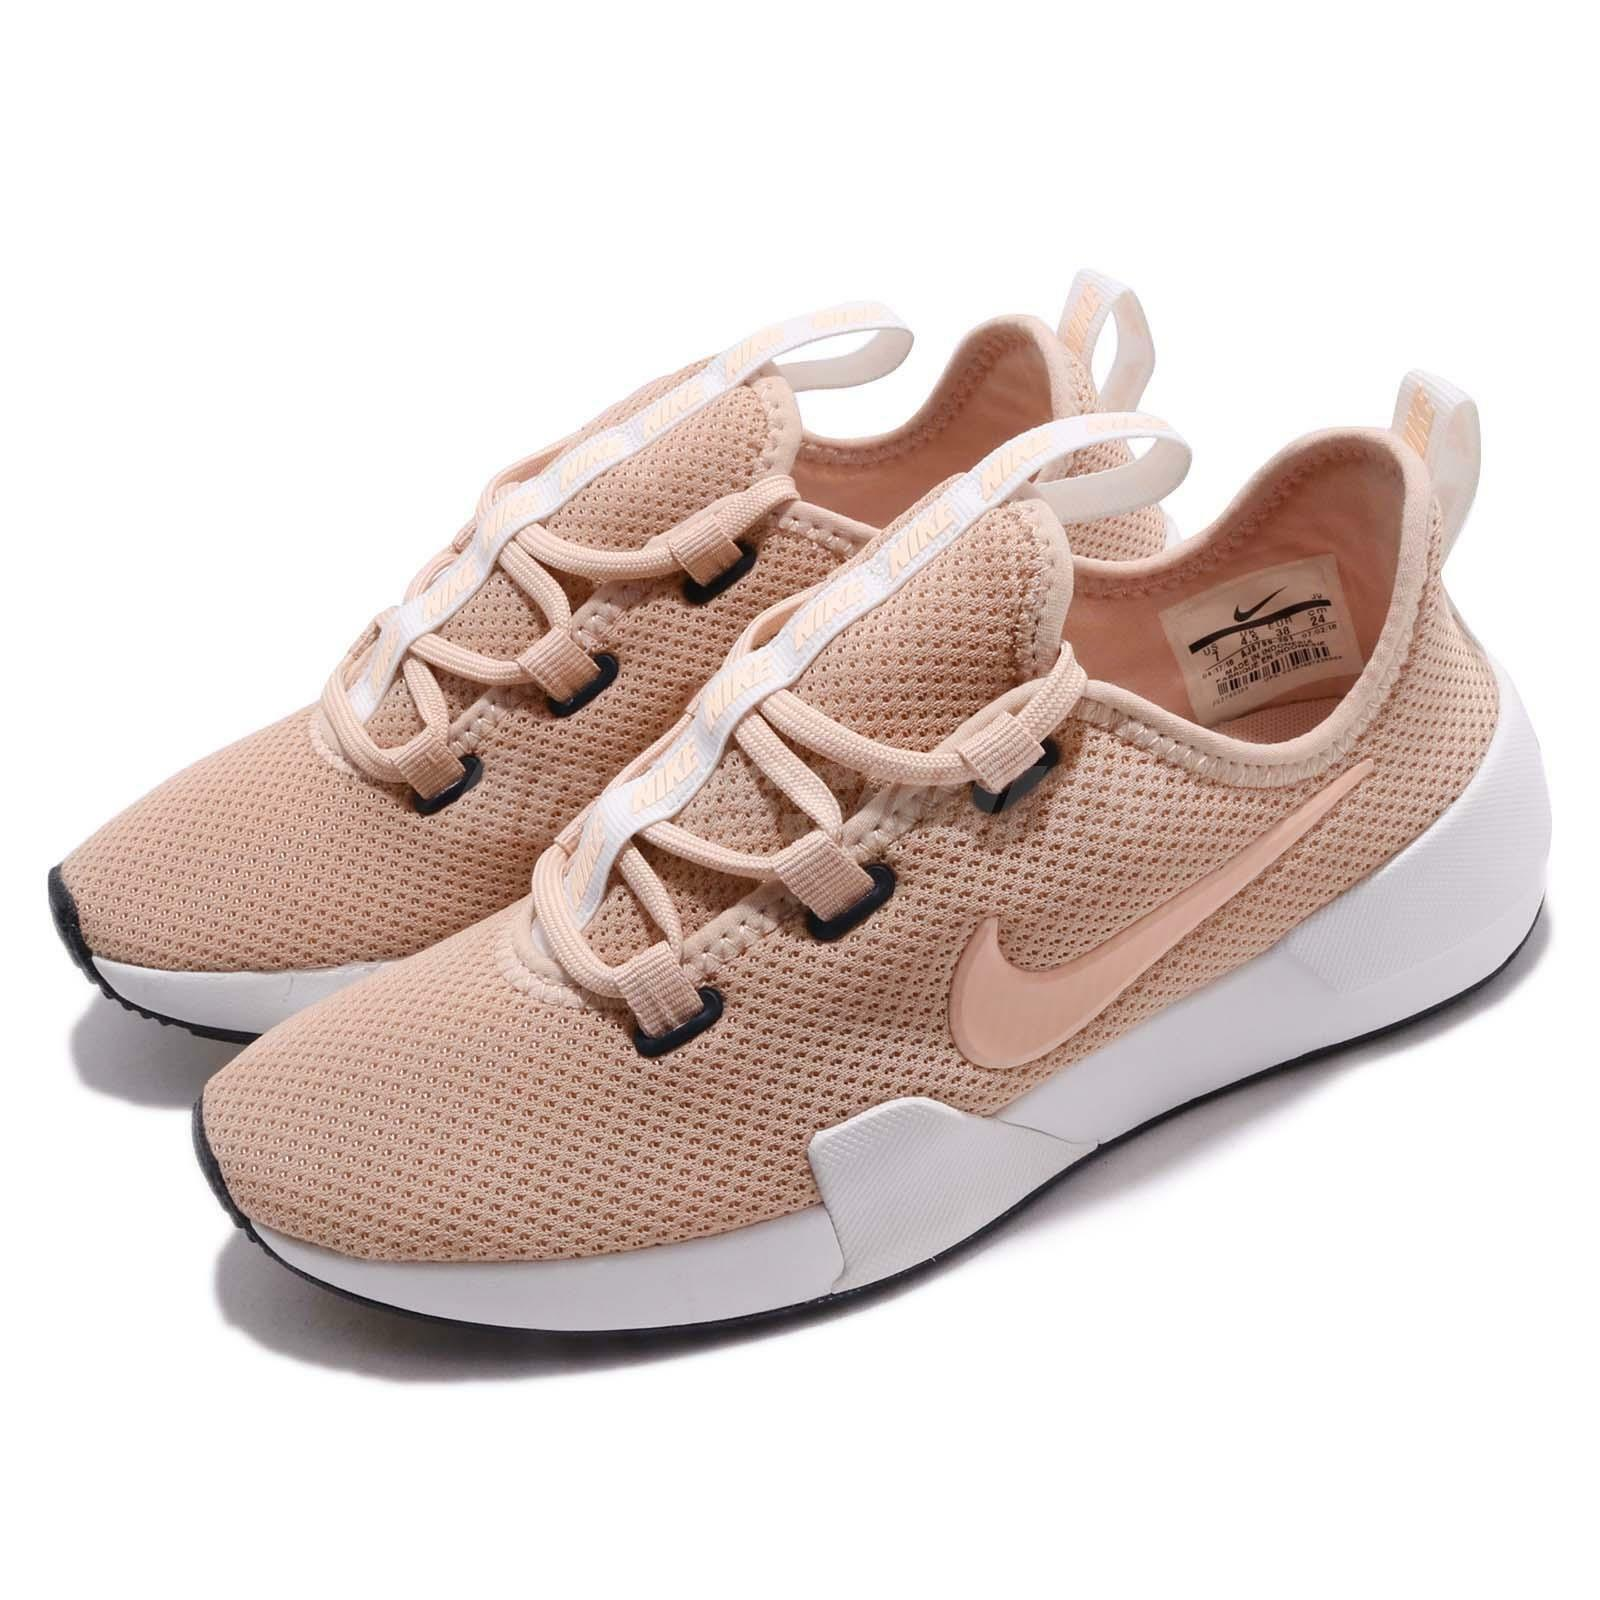 Nike Wmns Ashin Modern Particle Beige Crimson Tint Women Running shoes AJ8799-201